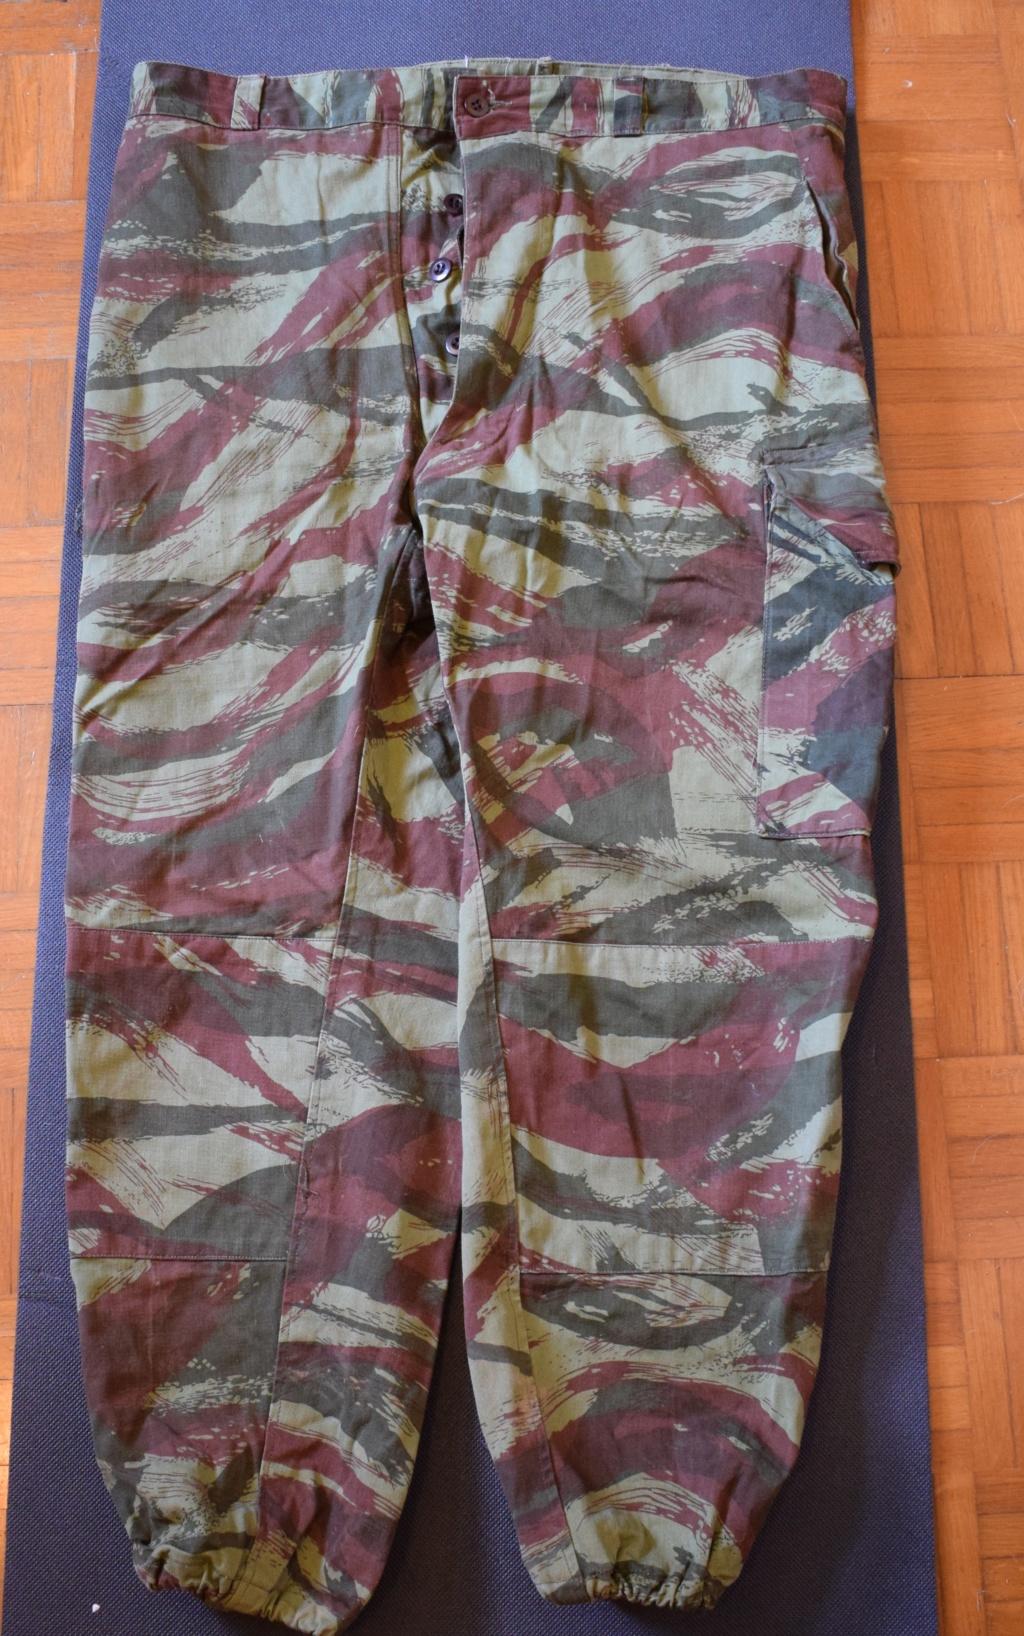 Renseignement pantalon tta47/59 camo léopard Tta810